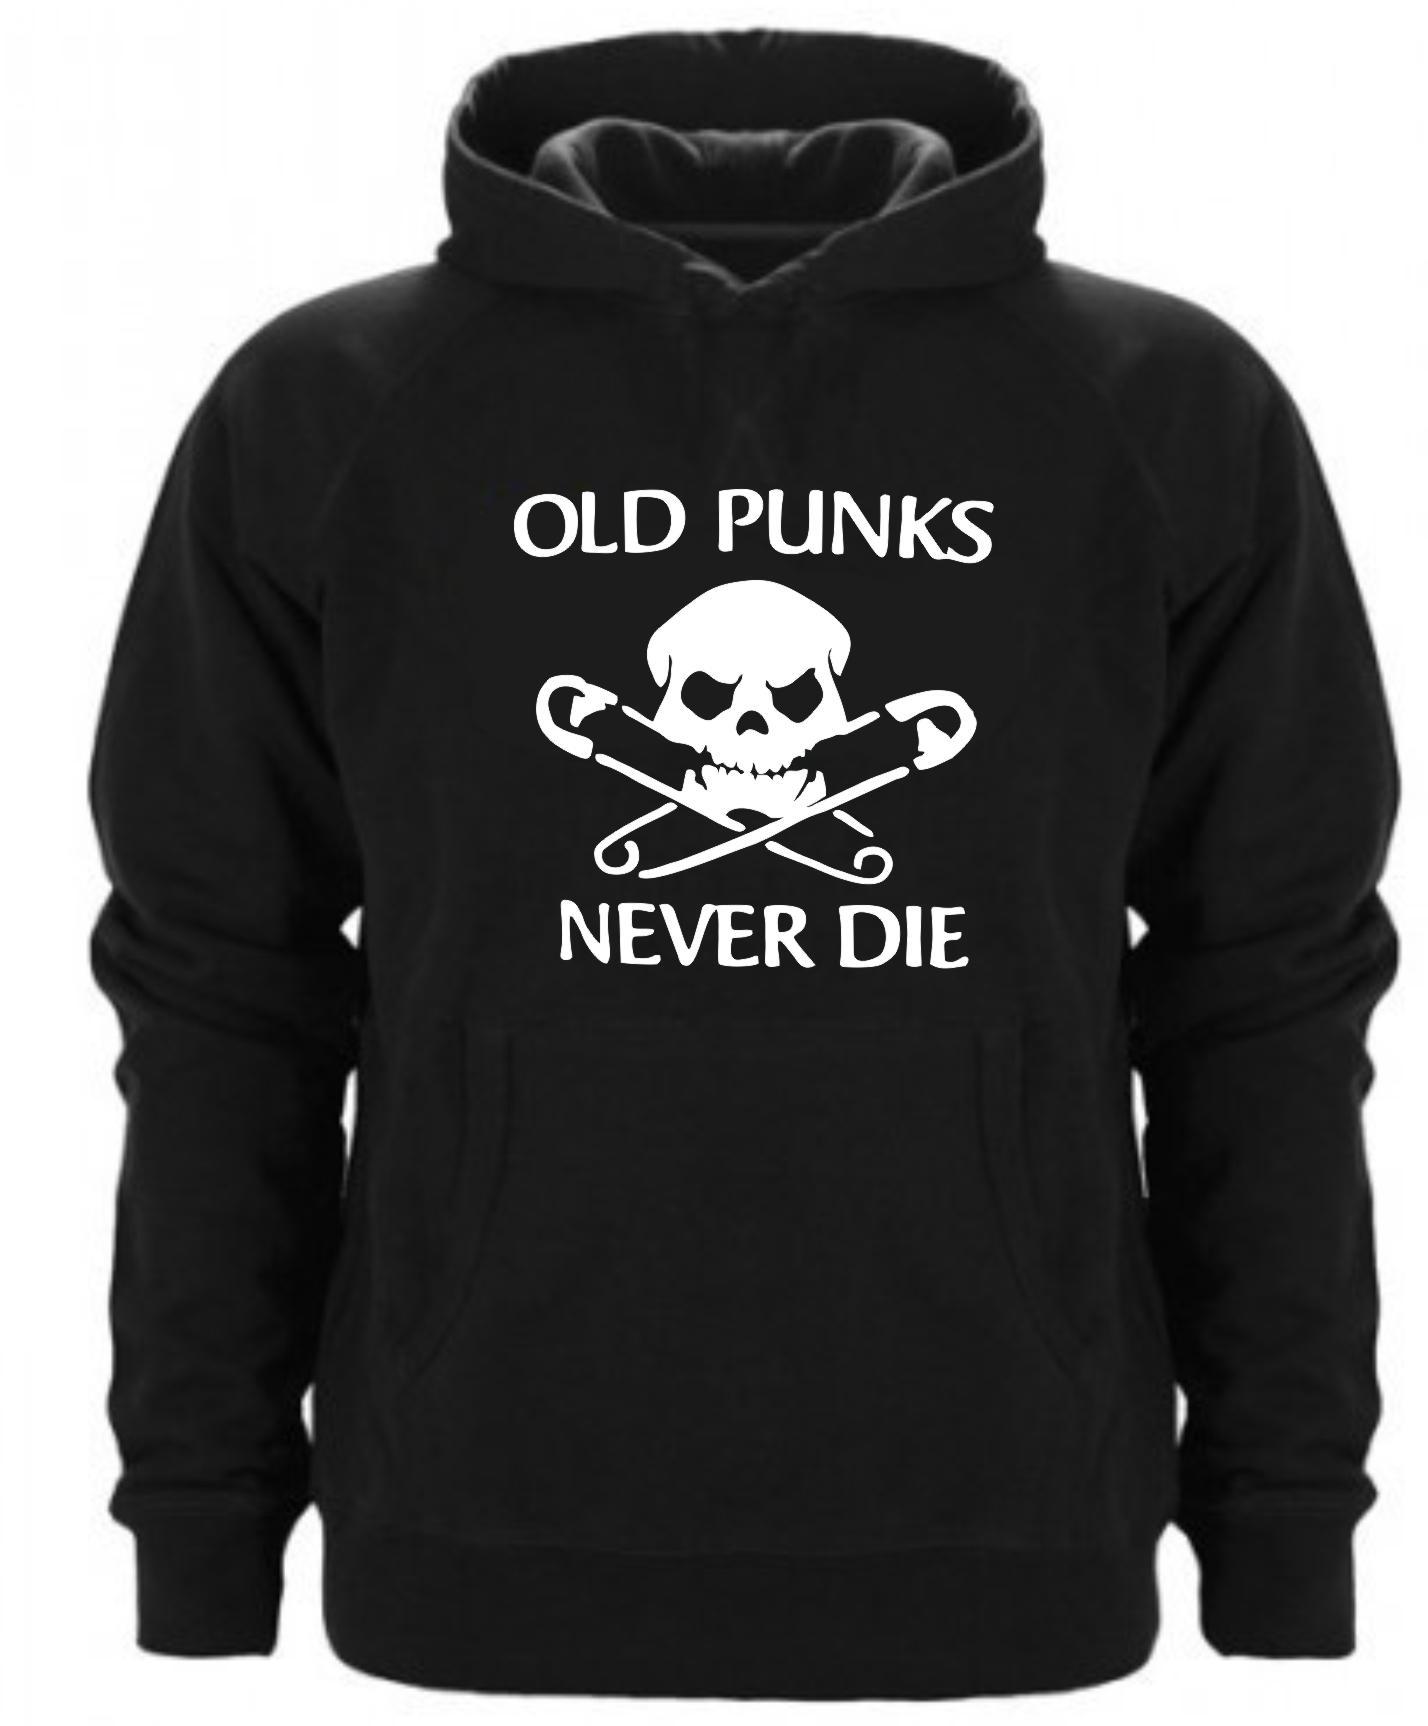 SUDADERA CAPUCHA OLD PUNKS NEVER DIE